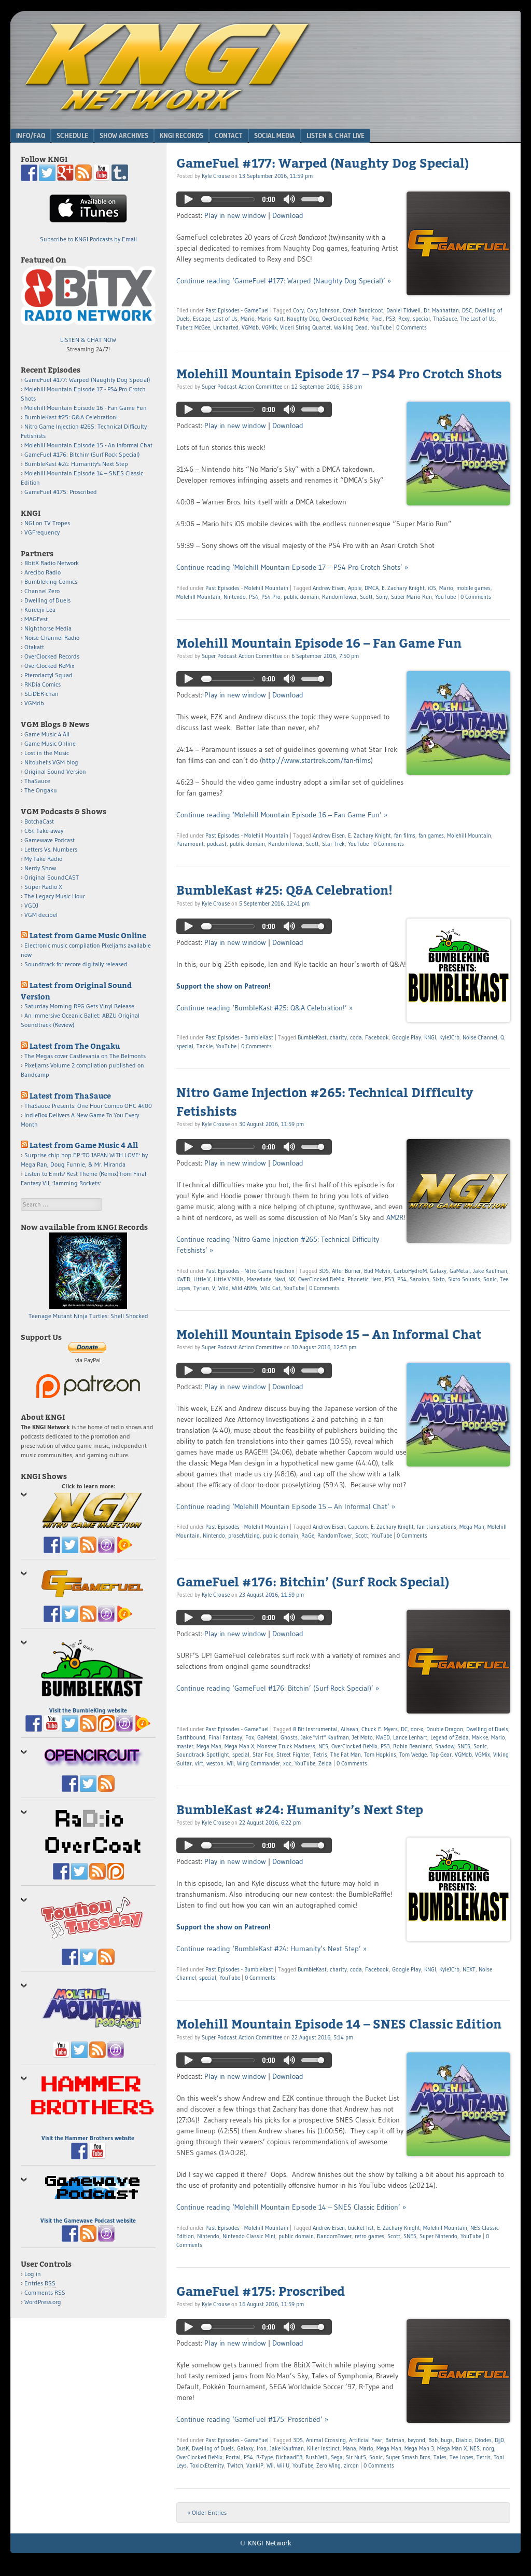 Kngi Video Game Music Podcast Network Competitors, Revenue